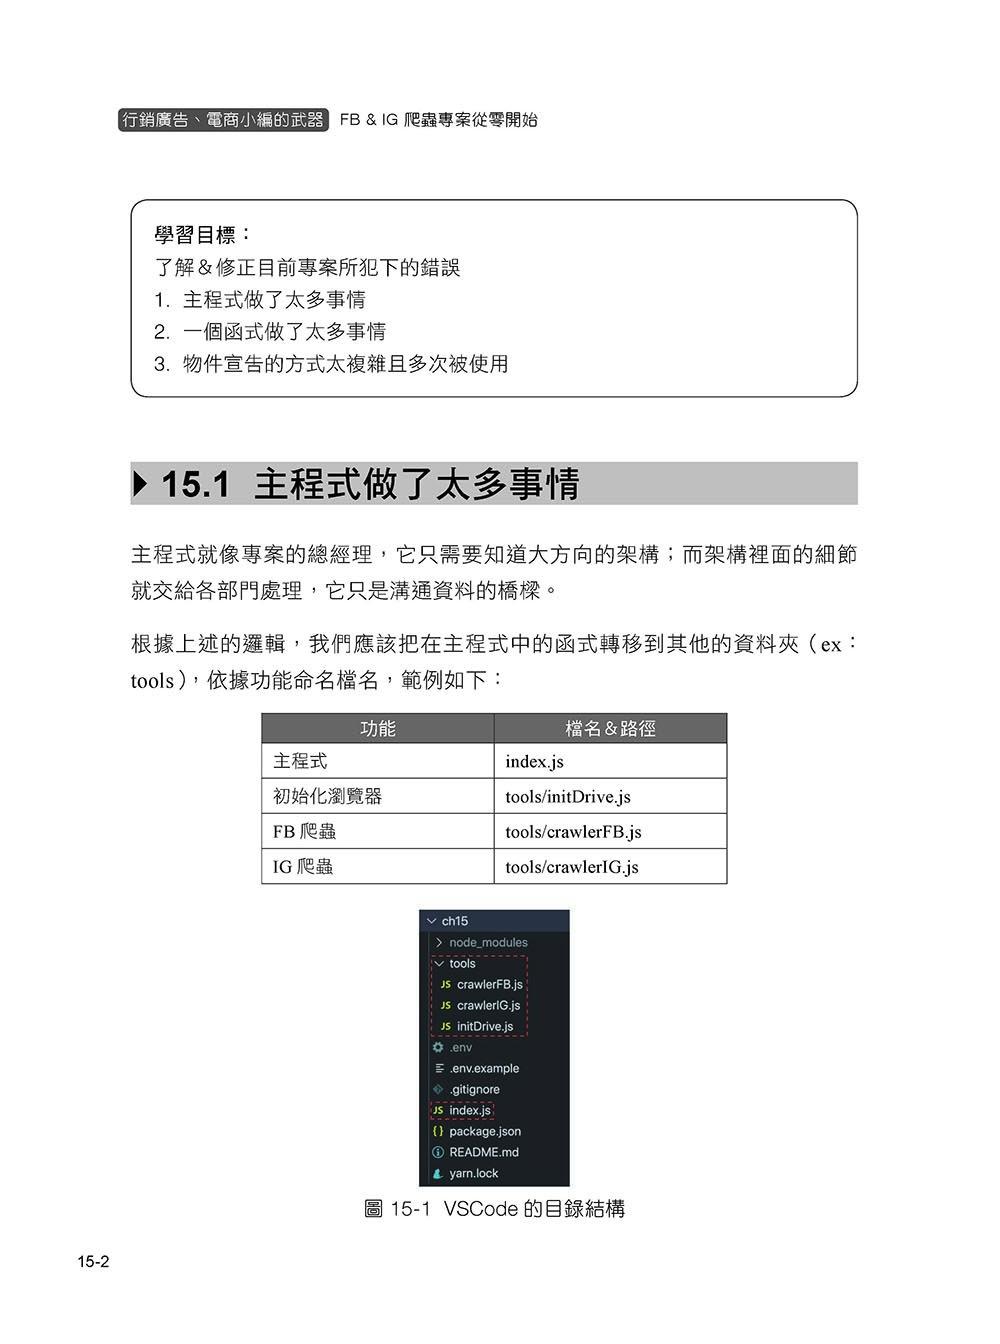 JavaScript 爬蟲新思路!從零開始帶你用 Node.js 打造 FB&IG 爬蟲專案(iT邦幫忙鐵人賽系列書)-preview-9